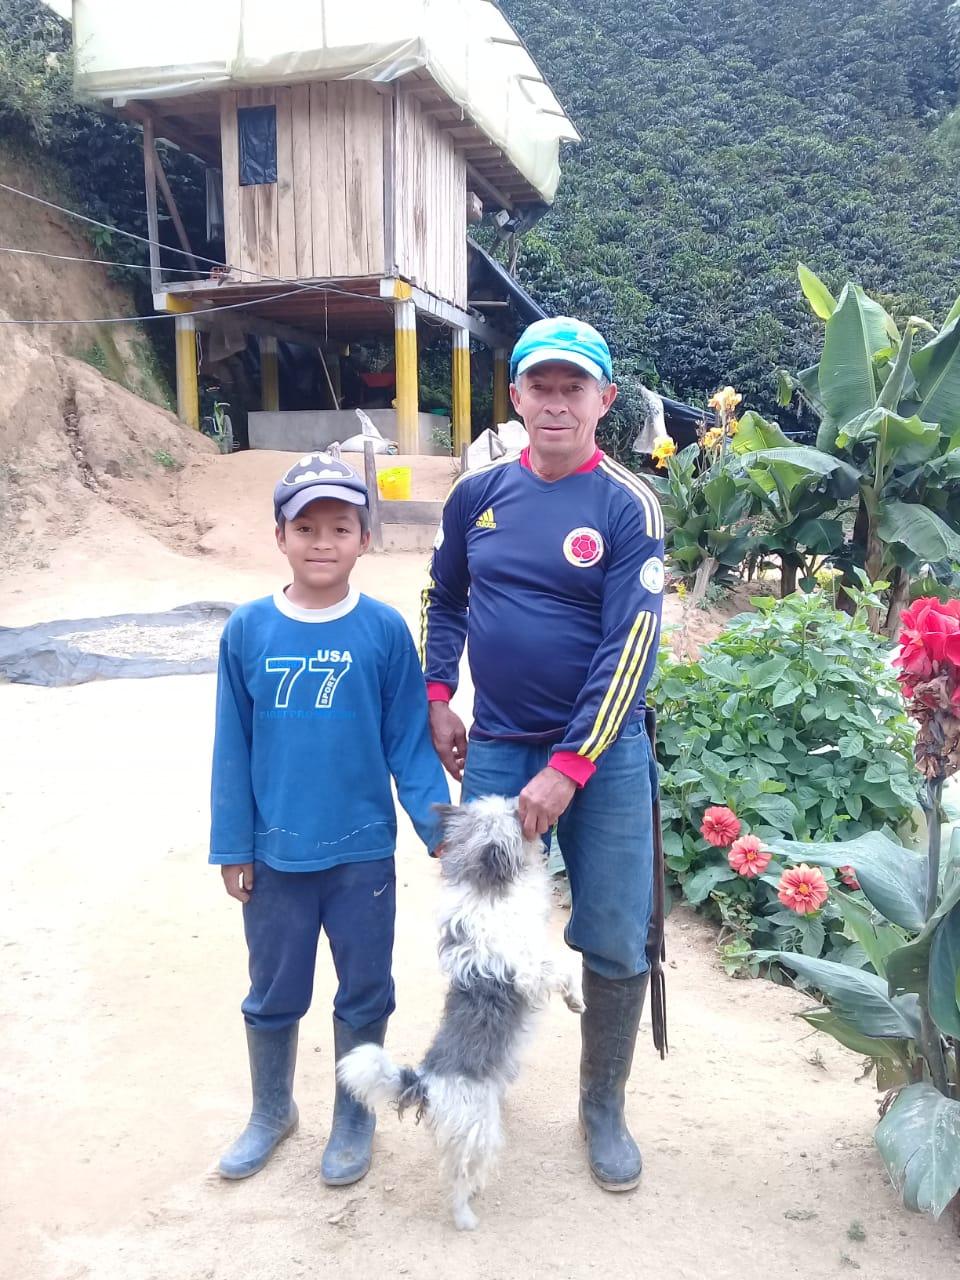 Jose Rincon and his son on their farm